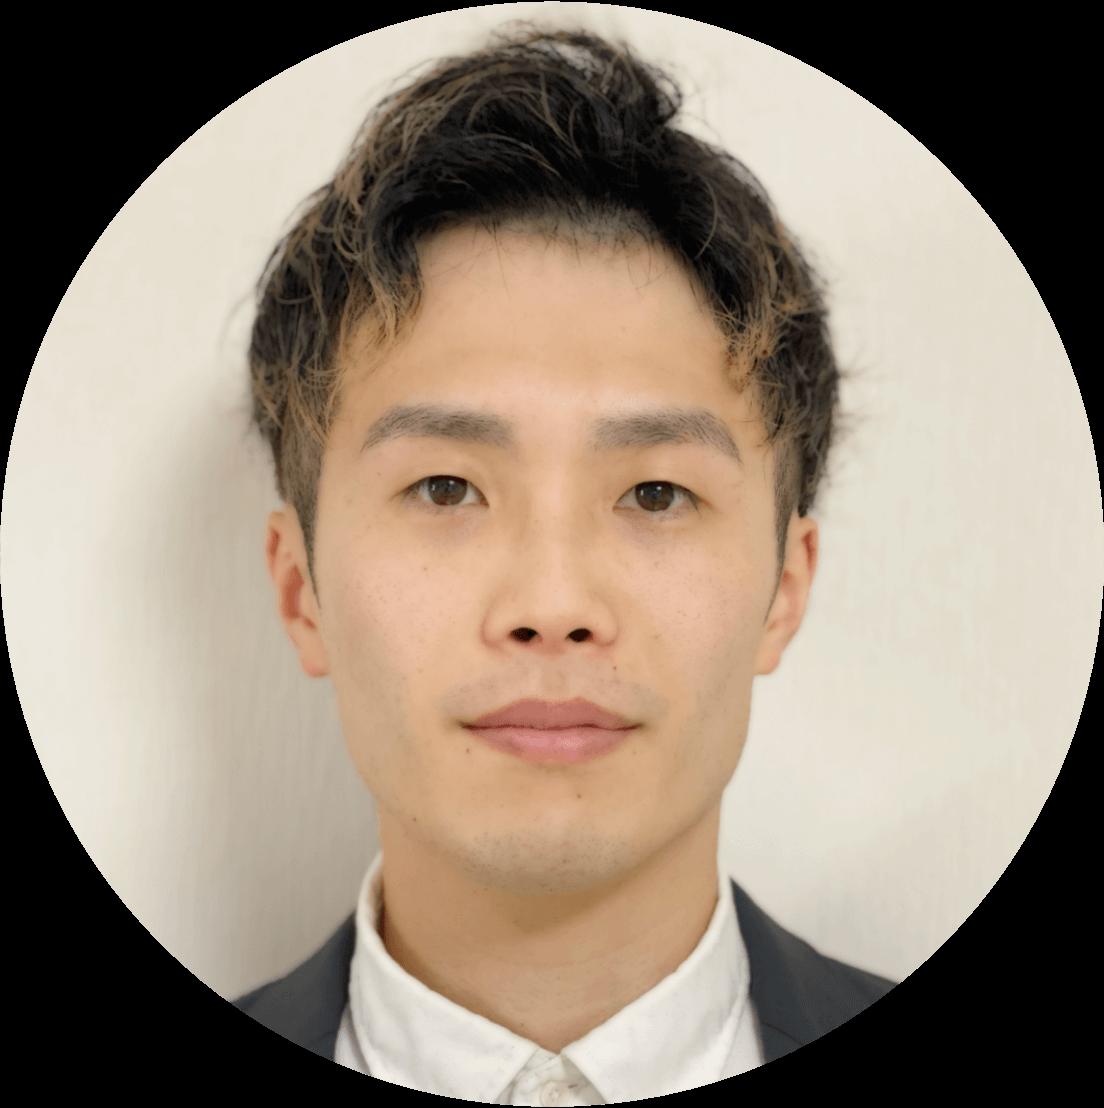 nakamura-face-photo